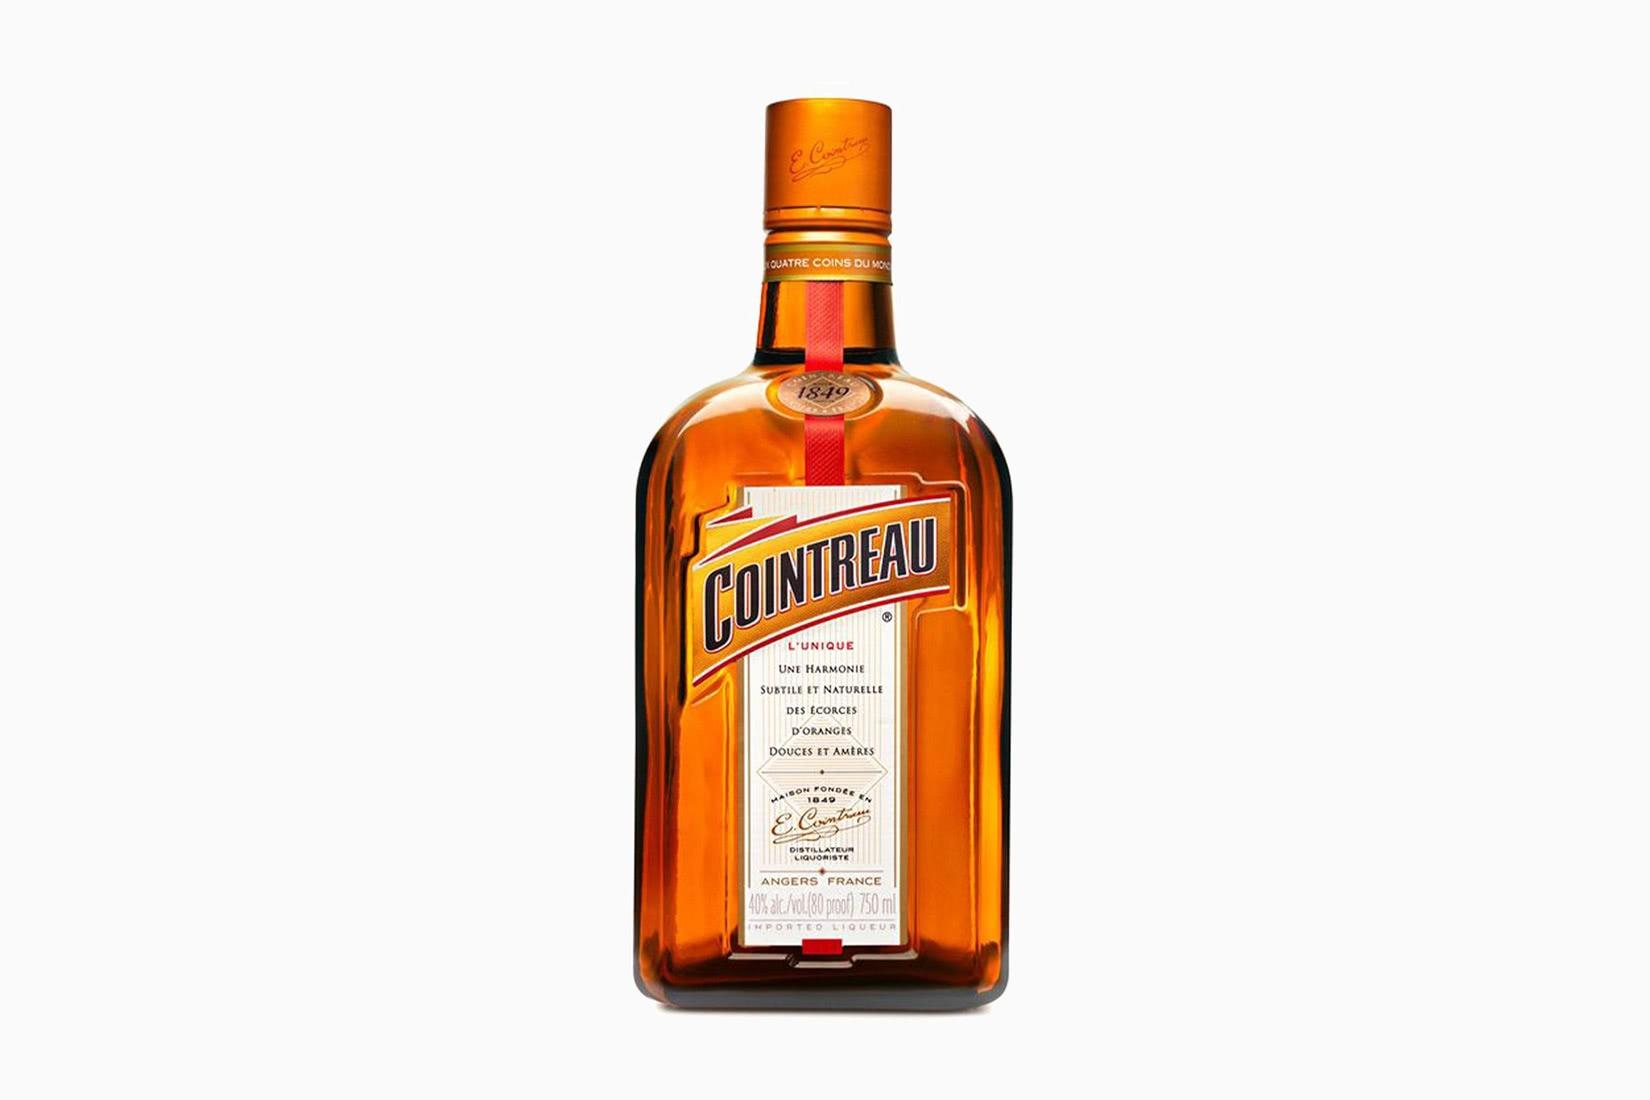 cointreau bottle price luxury liquor orange - Luxe Digital